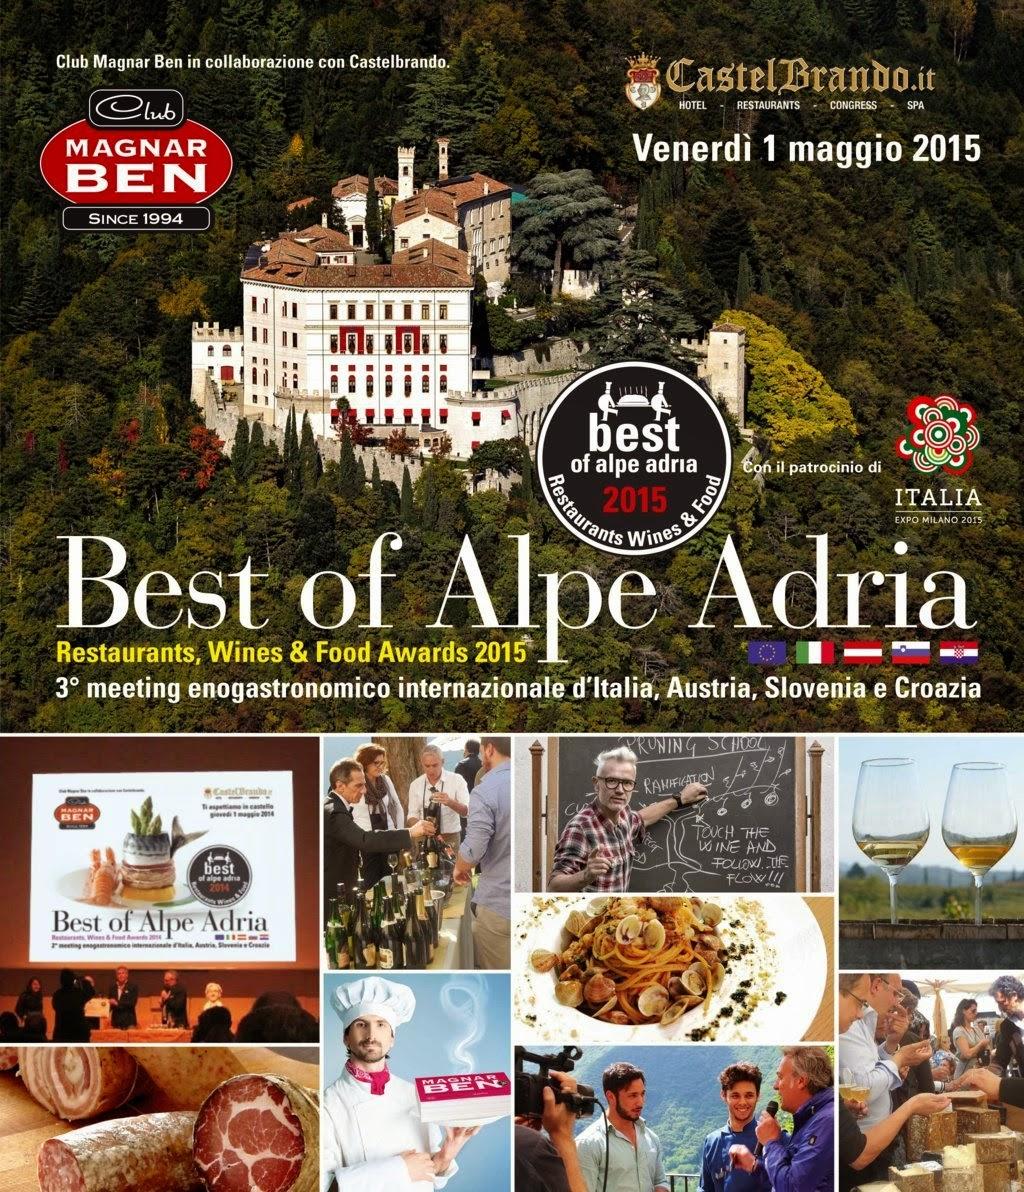 Best of Alpe Adria a Castelbrando Cison di Valmarino (TV)